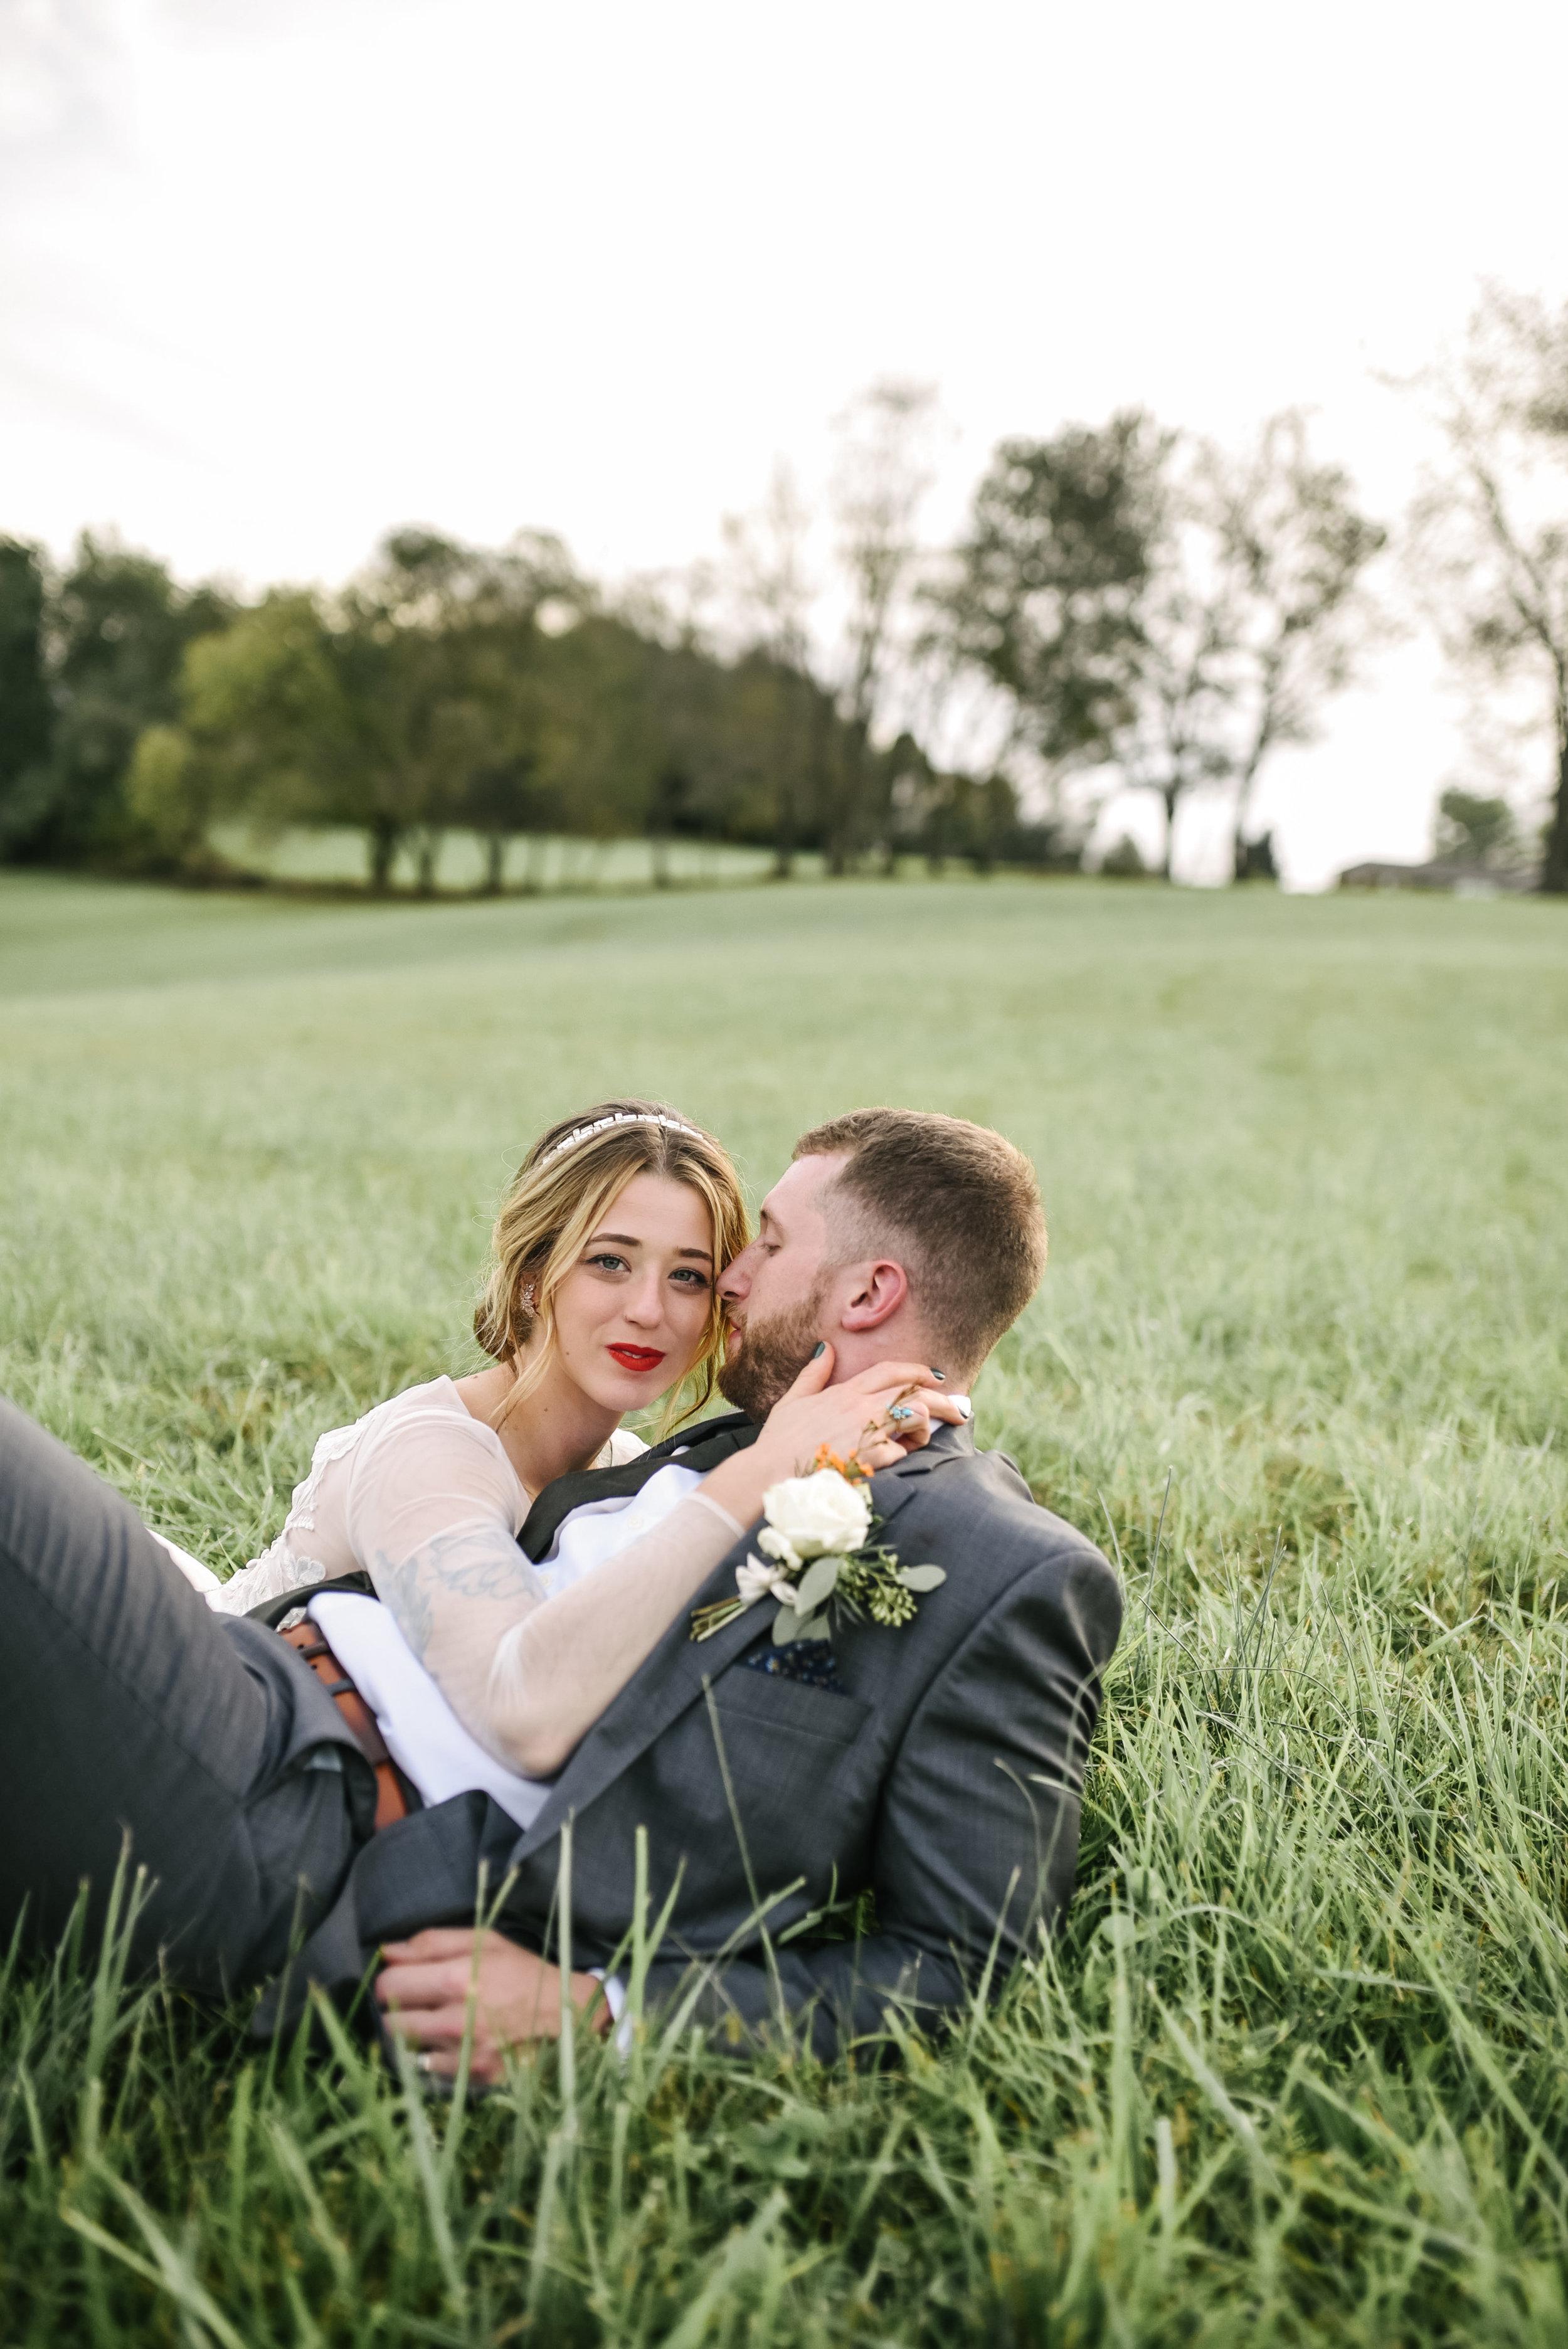 agpcollective_korn_coupleportraits-0598.jpg